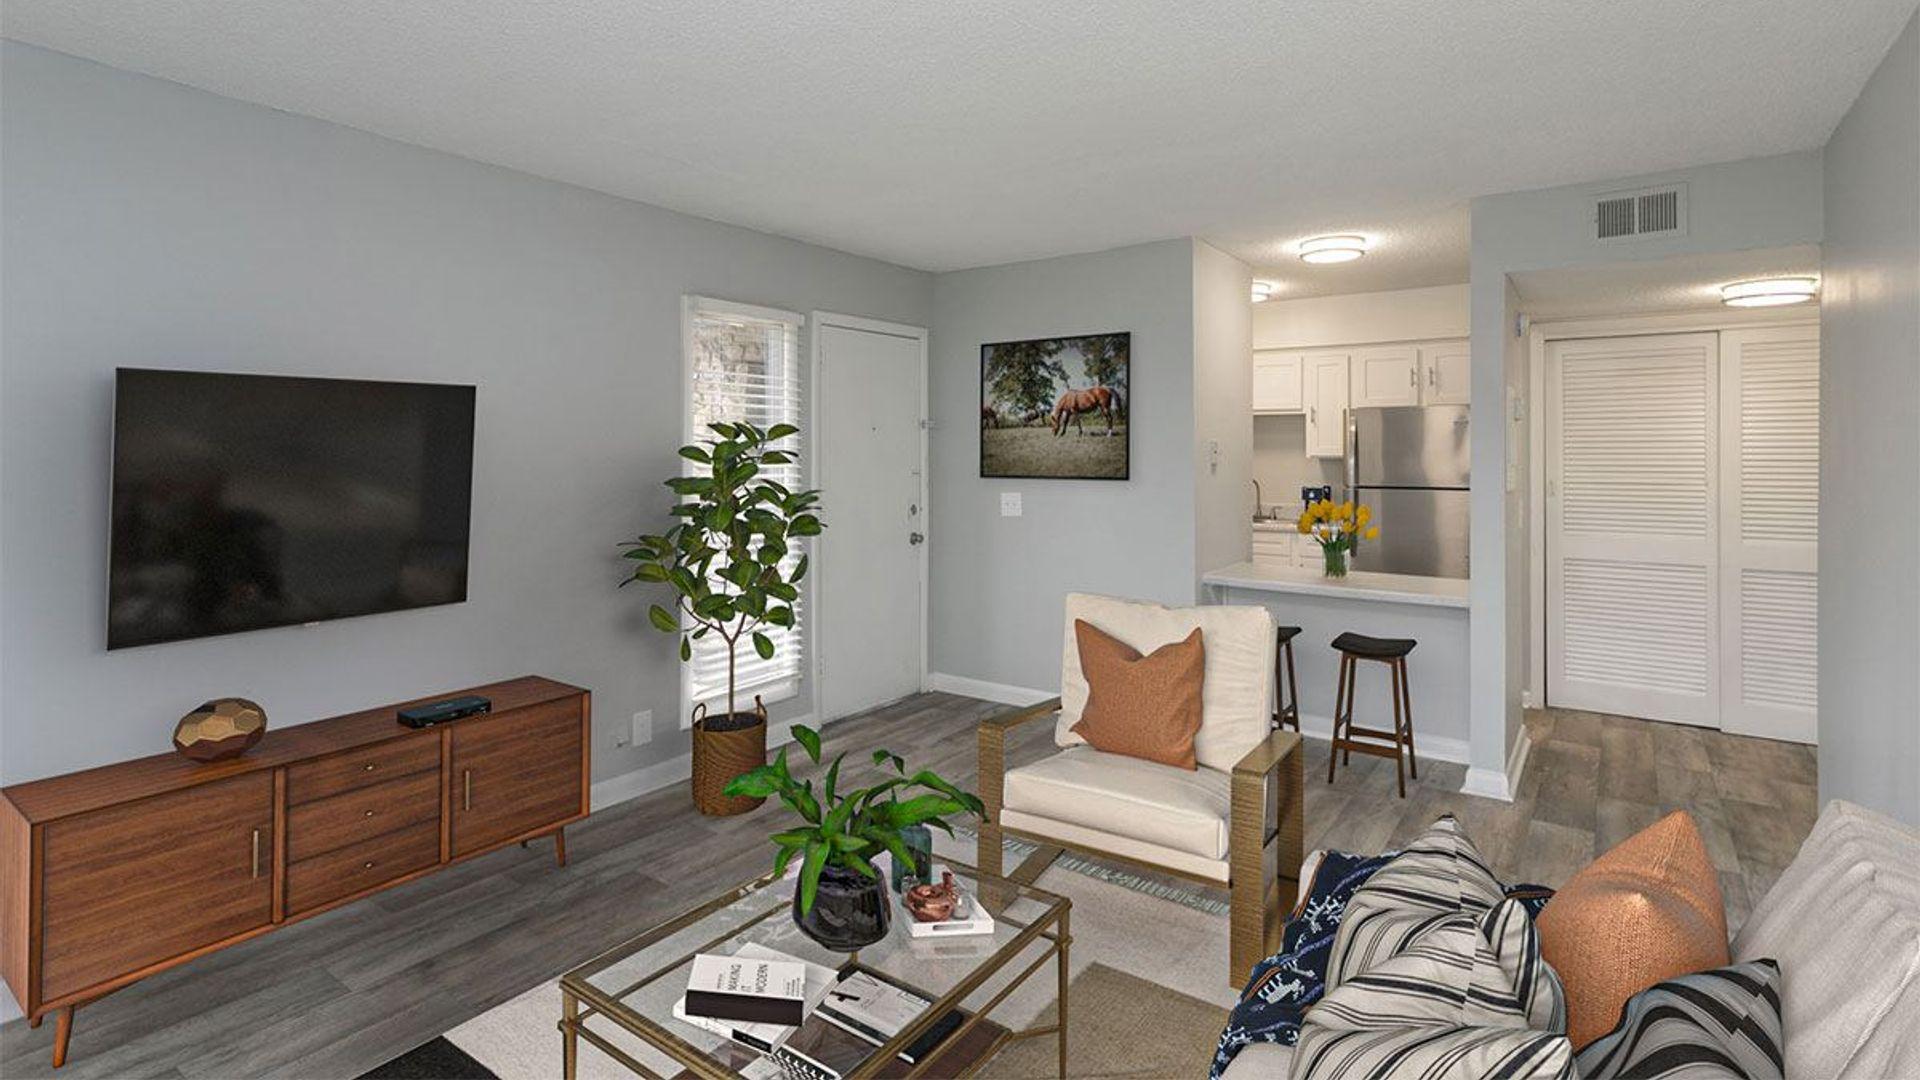 1 bedroom apartment at Nashville, TN   #21867281   Rentberry